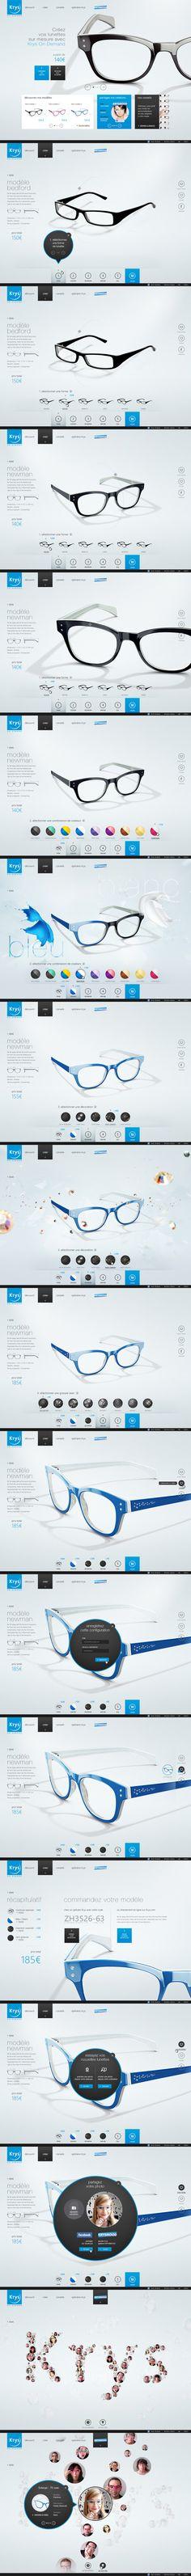 Designer: Yul